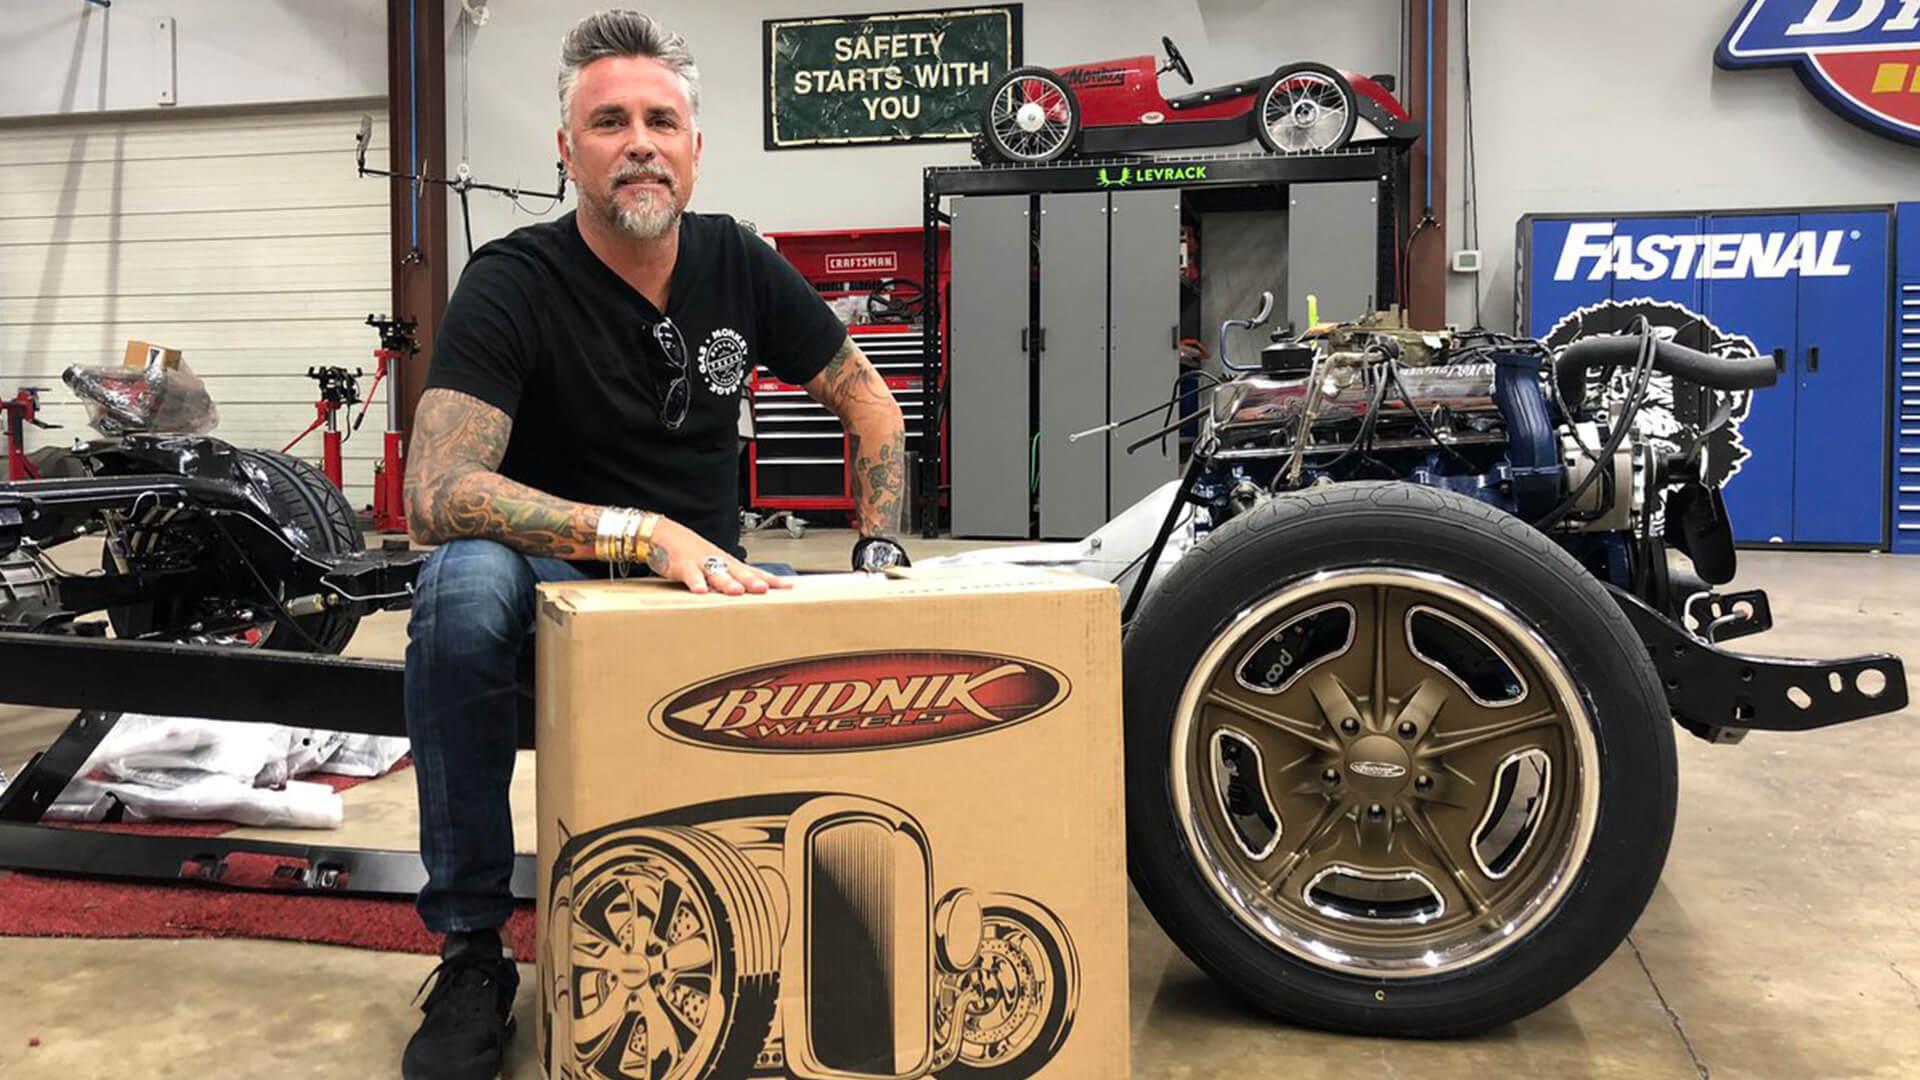 Levrack Ambassador Richard Rawlings of Gas Monkey Garage